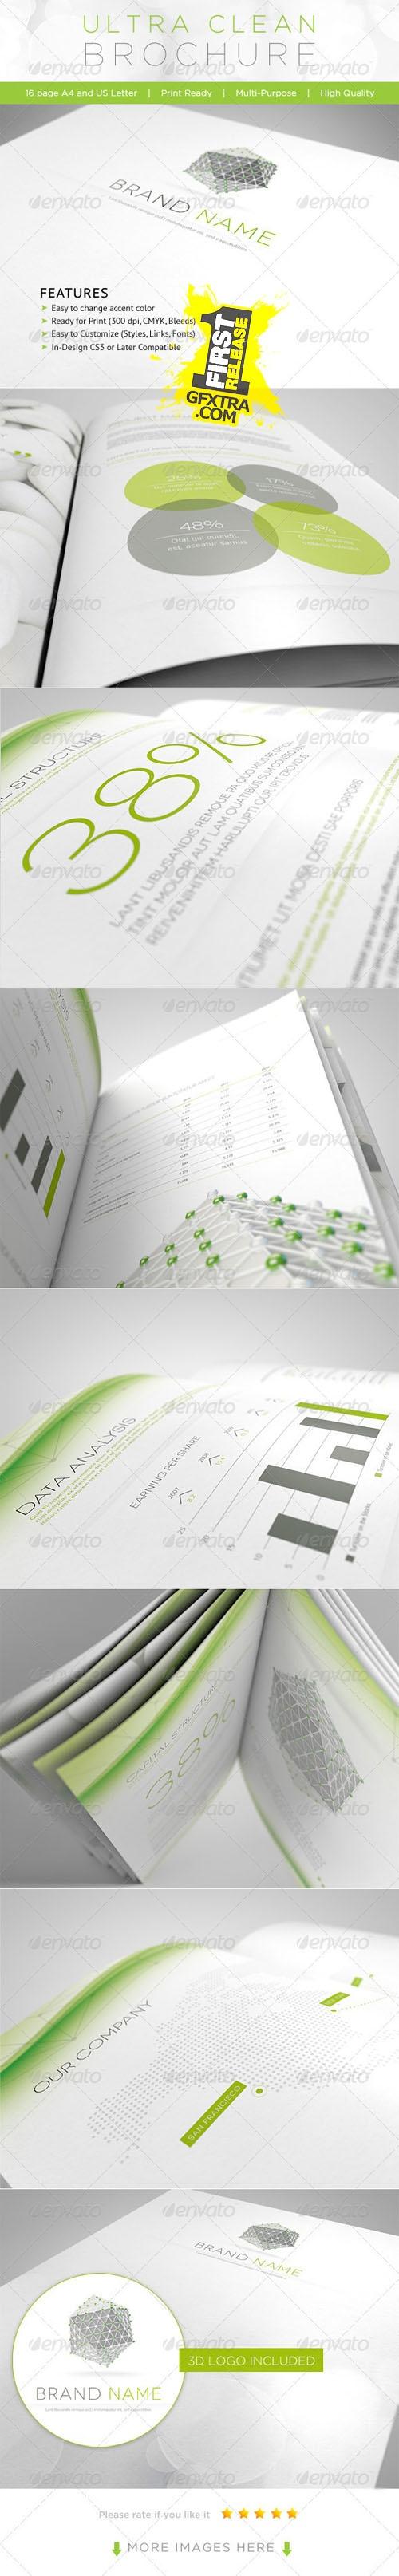 GraphicRiver: Ultra Clean Brochure